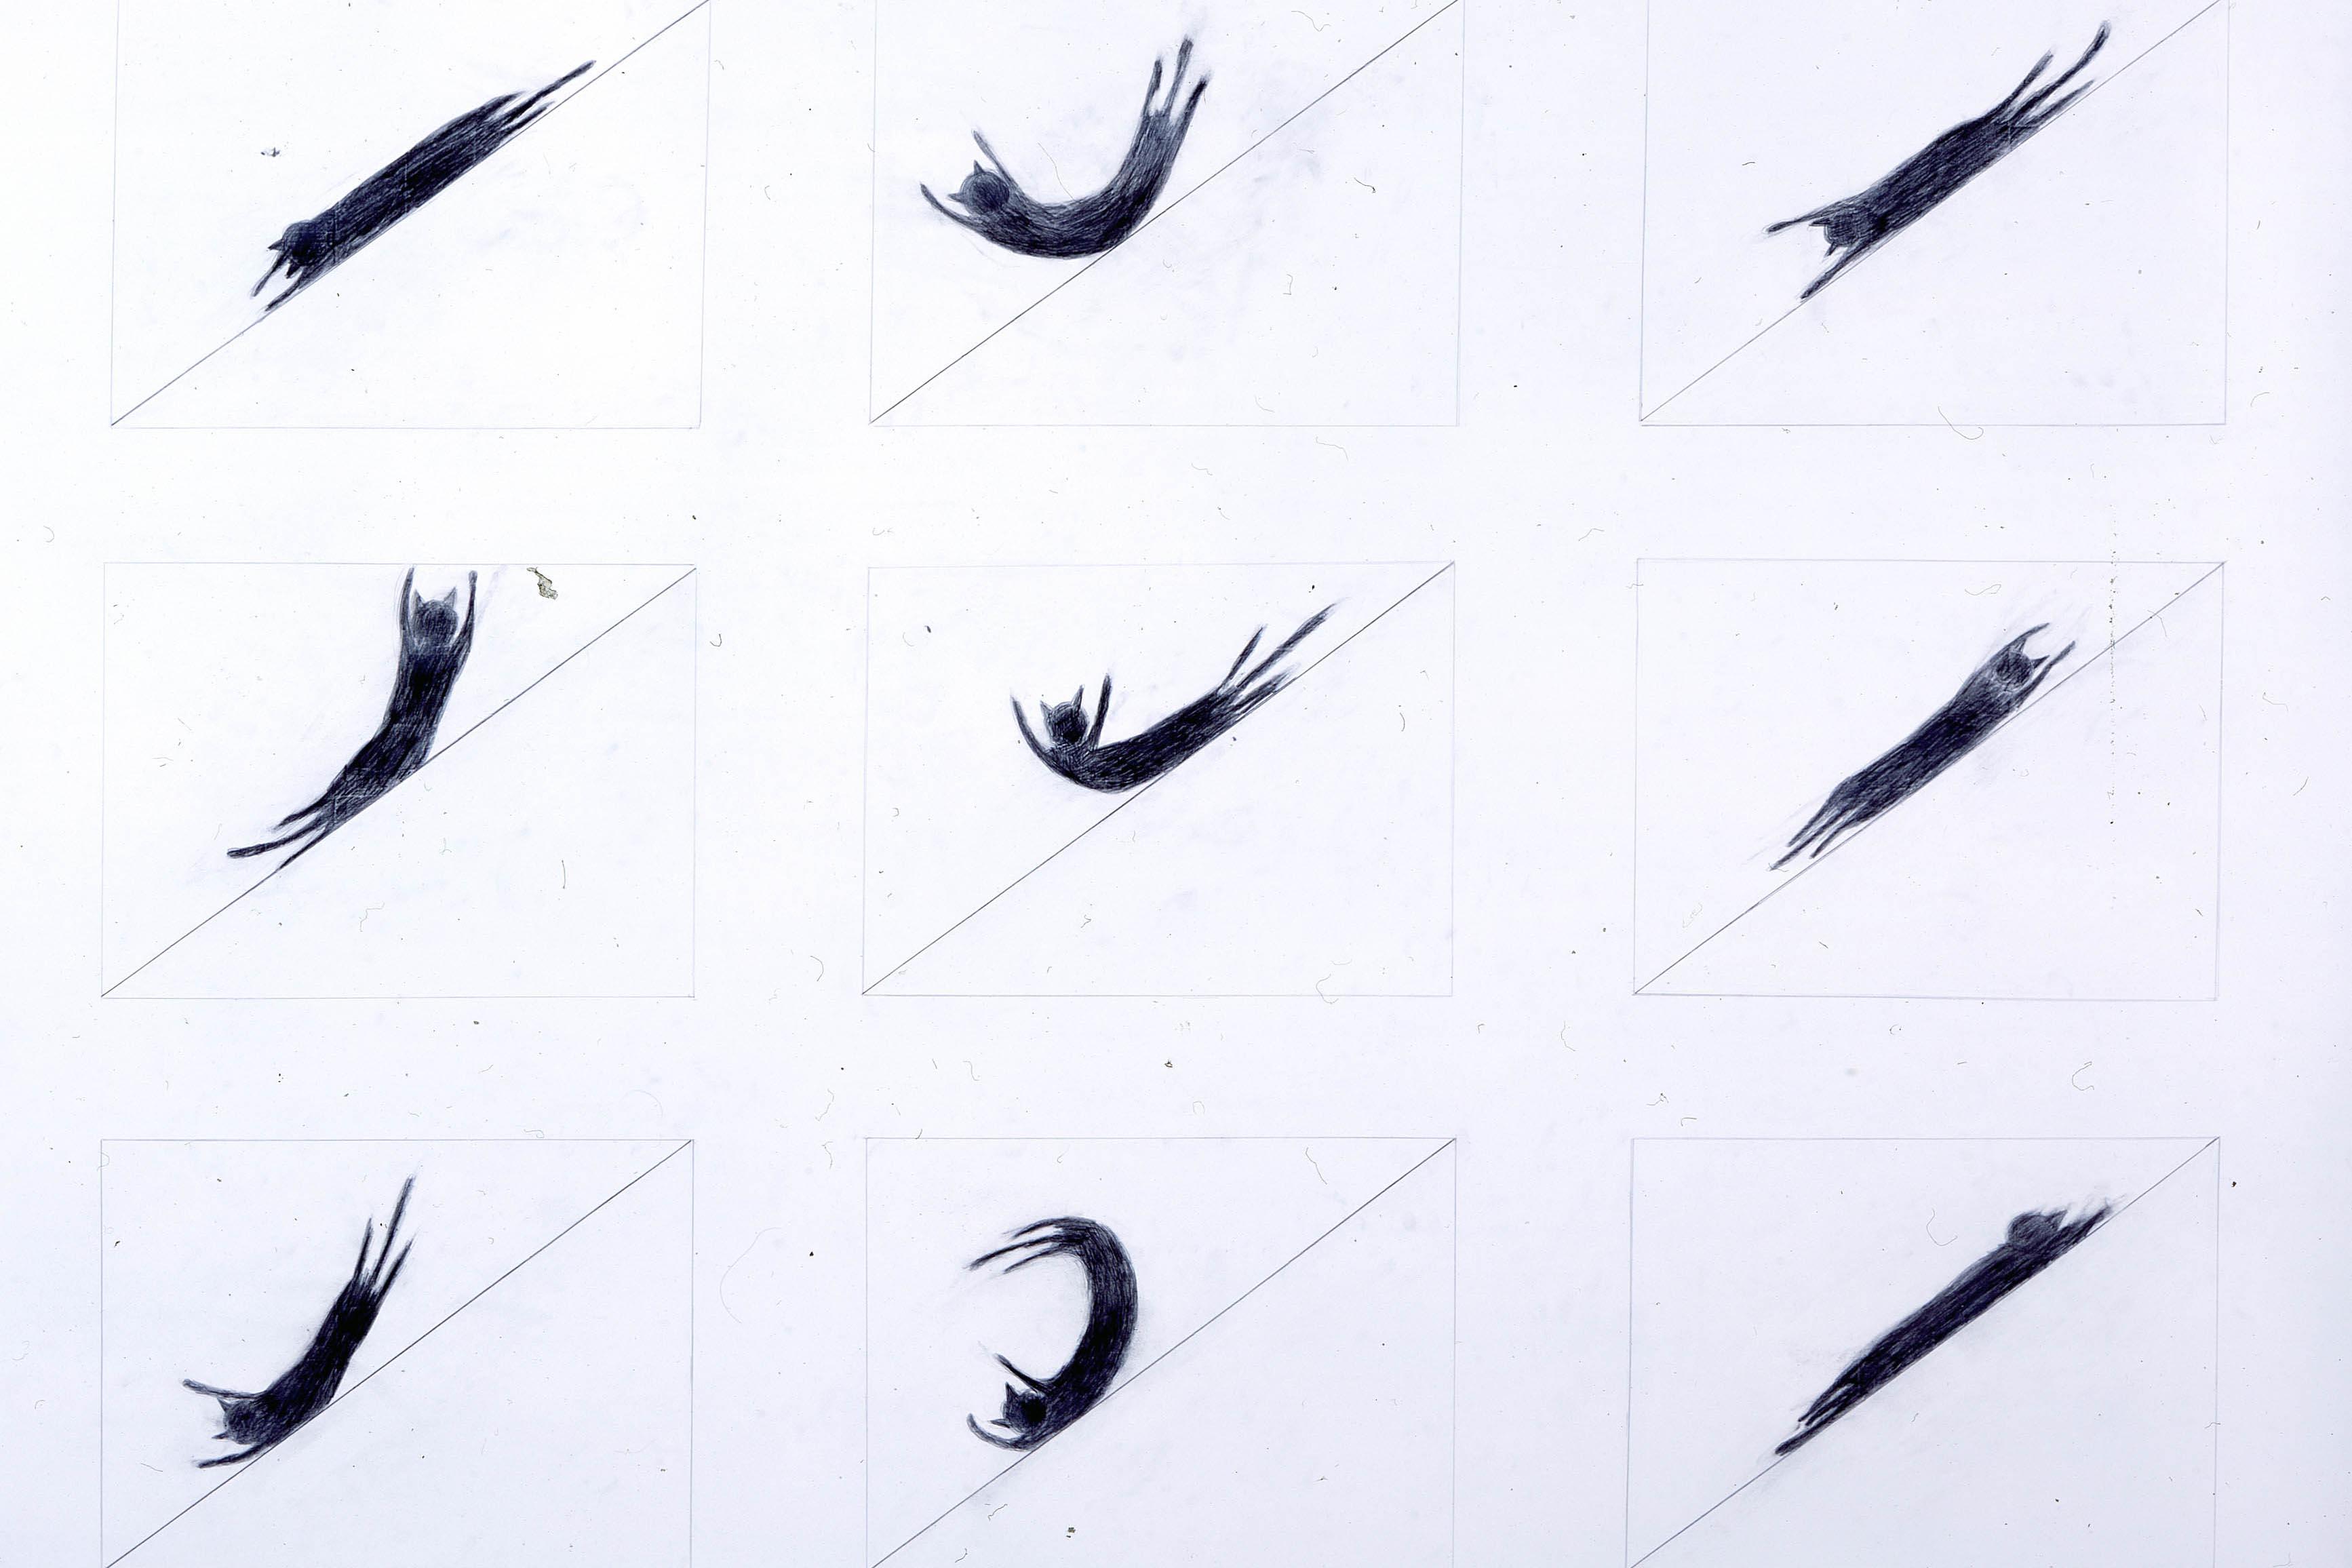 落合多武作品《Drawing For Cat Slide》(圖片由香港藝術中心提供)